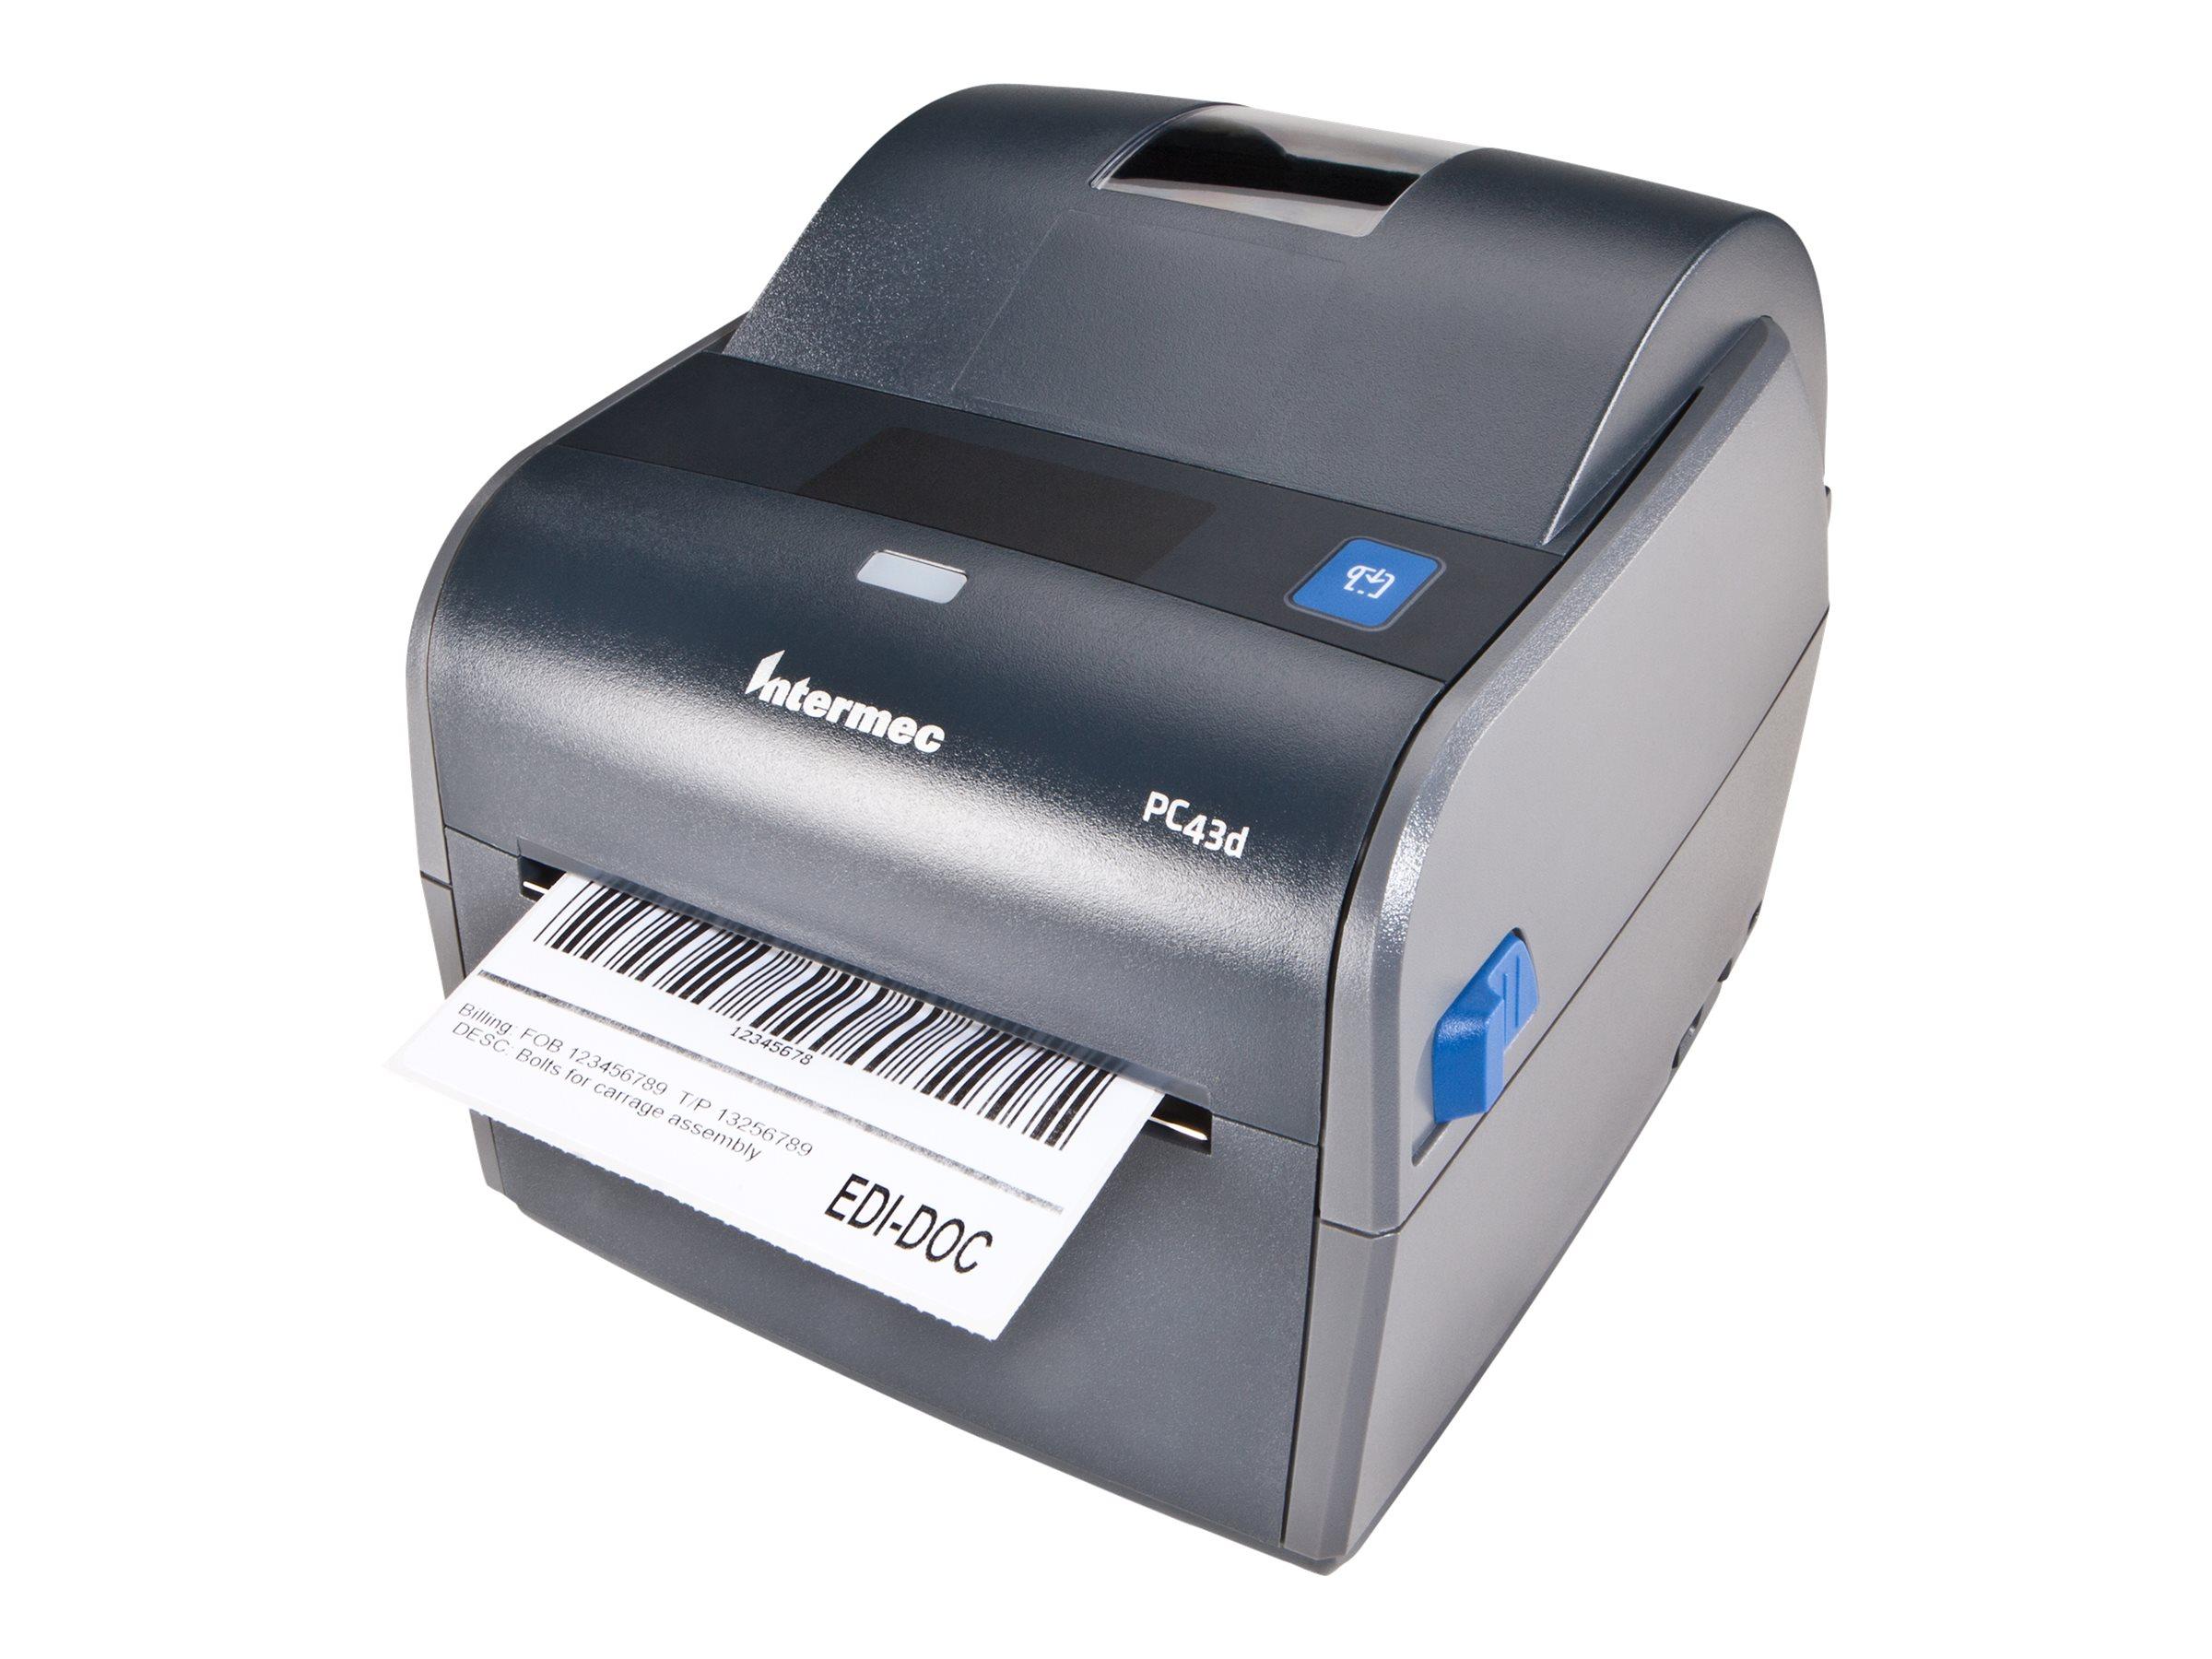 Intermec PC43d - Etikettendrucker - Thermodirekt - Rolle (11,8 cm) - 203 dpi - bis zu 203.2 mm/Sek.